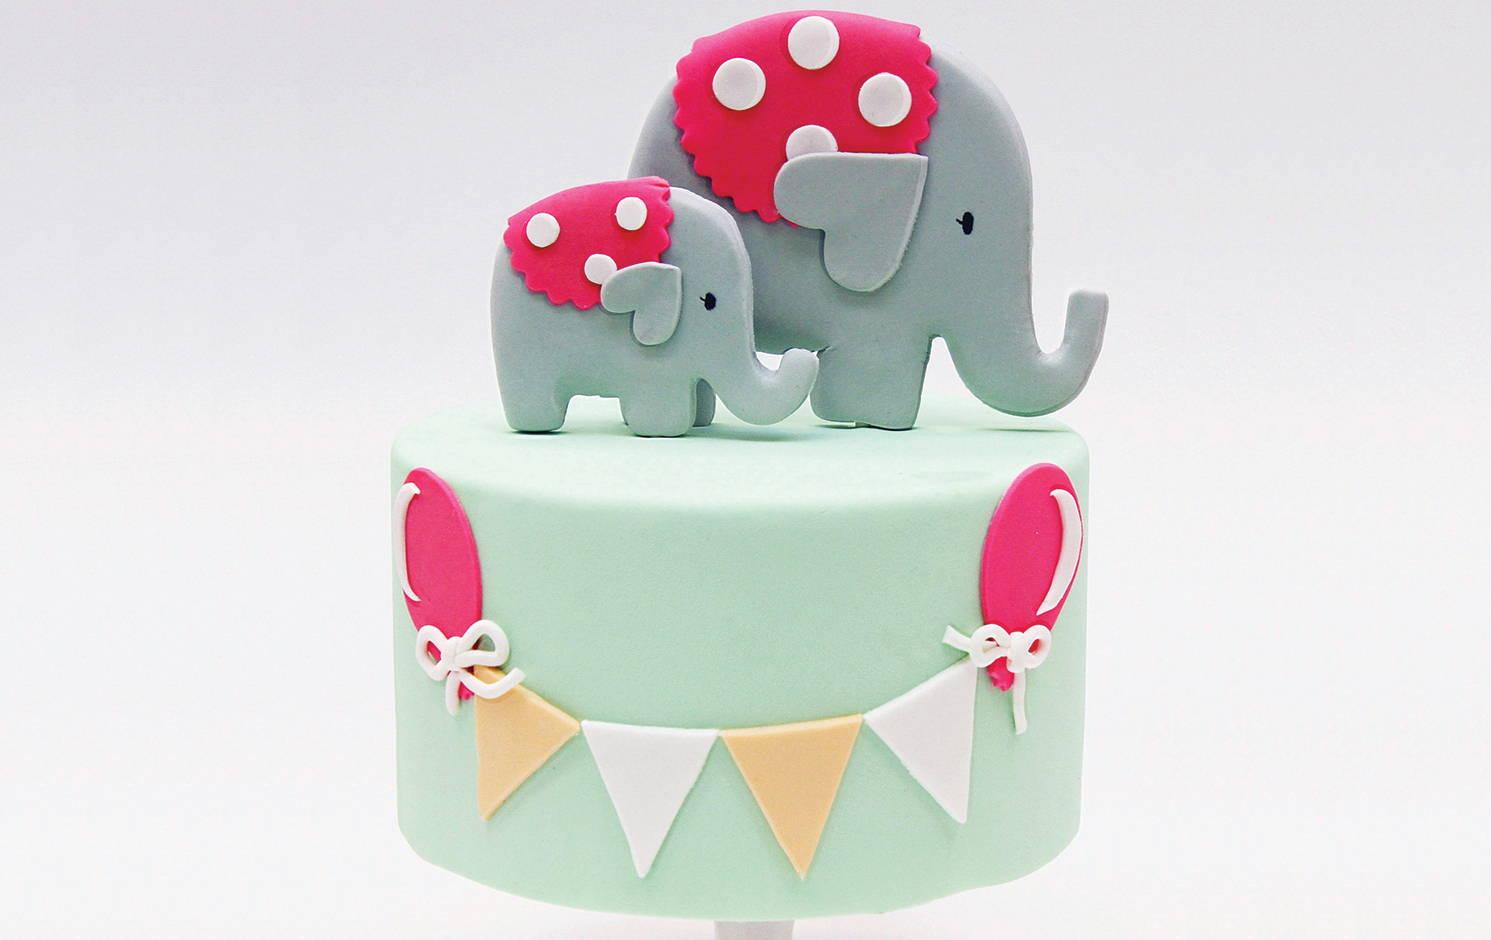 Elephant Cake Topper Tutorial DIY | Fondant Step by Step ...